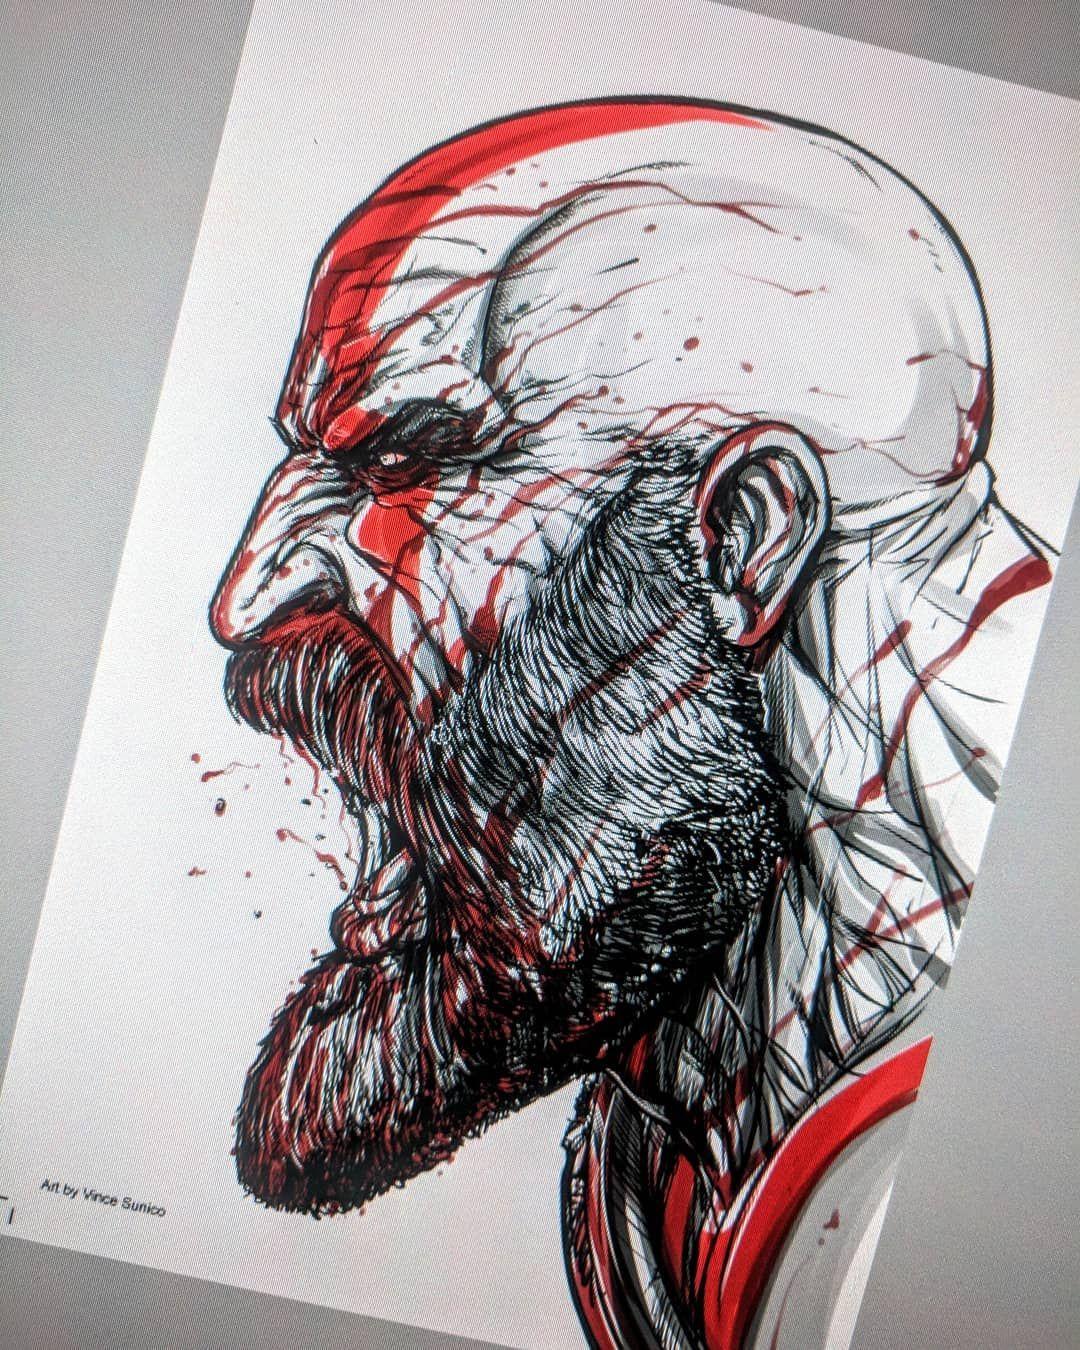 Vince Sunico On Instagram Kratos Digital Stuff Using Clipart